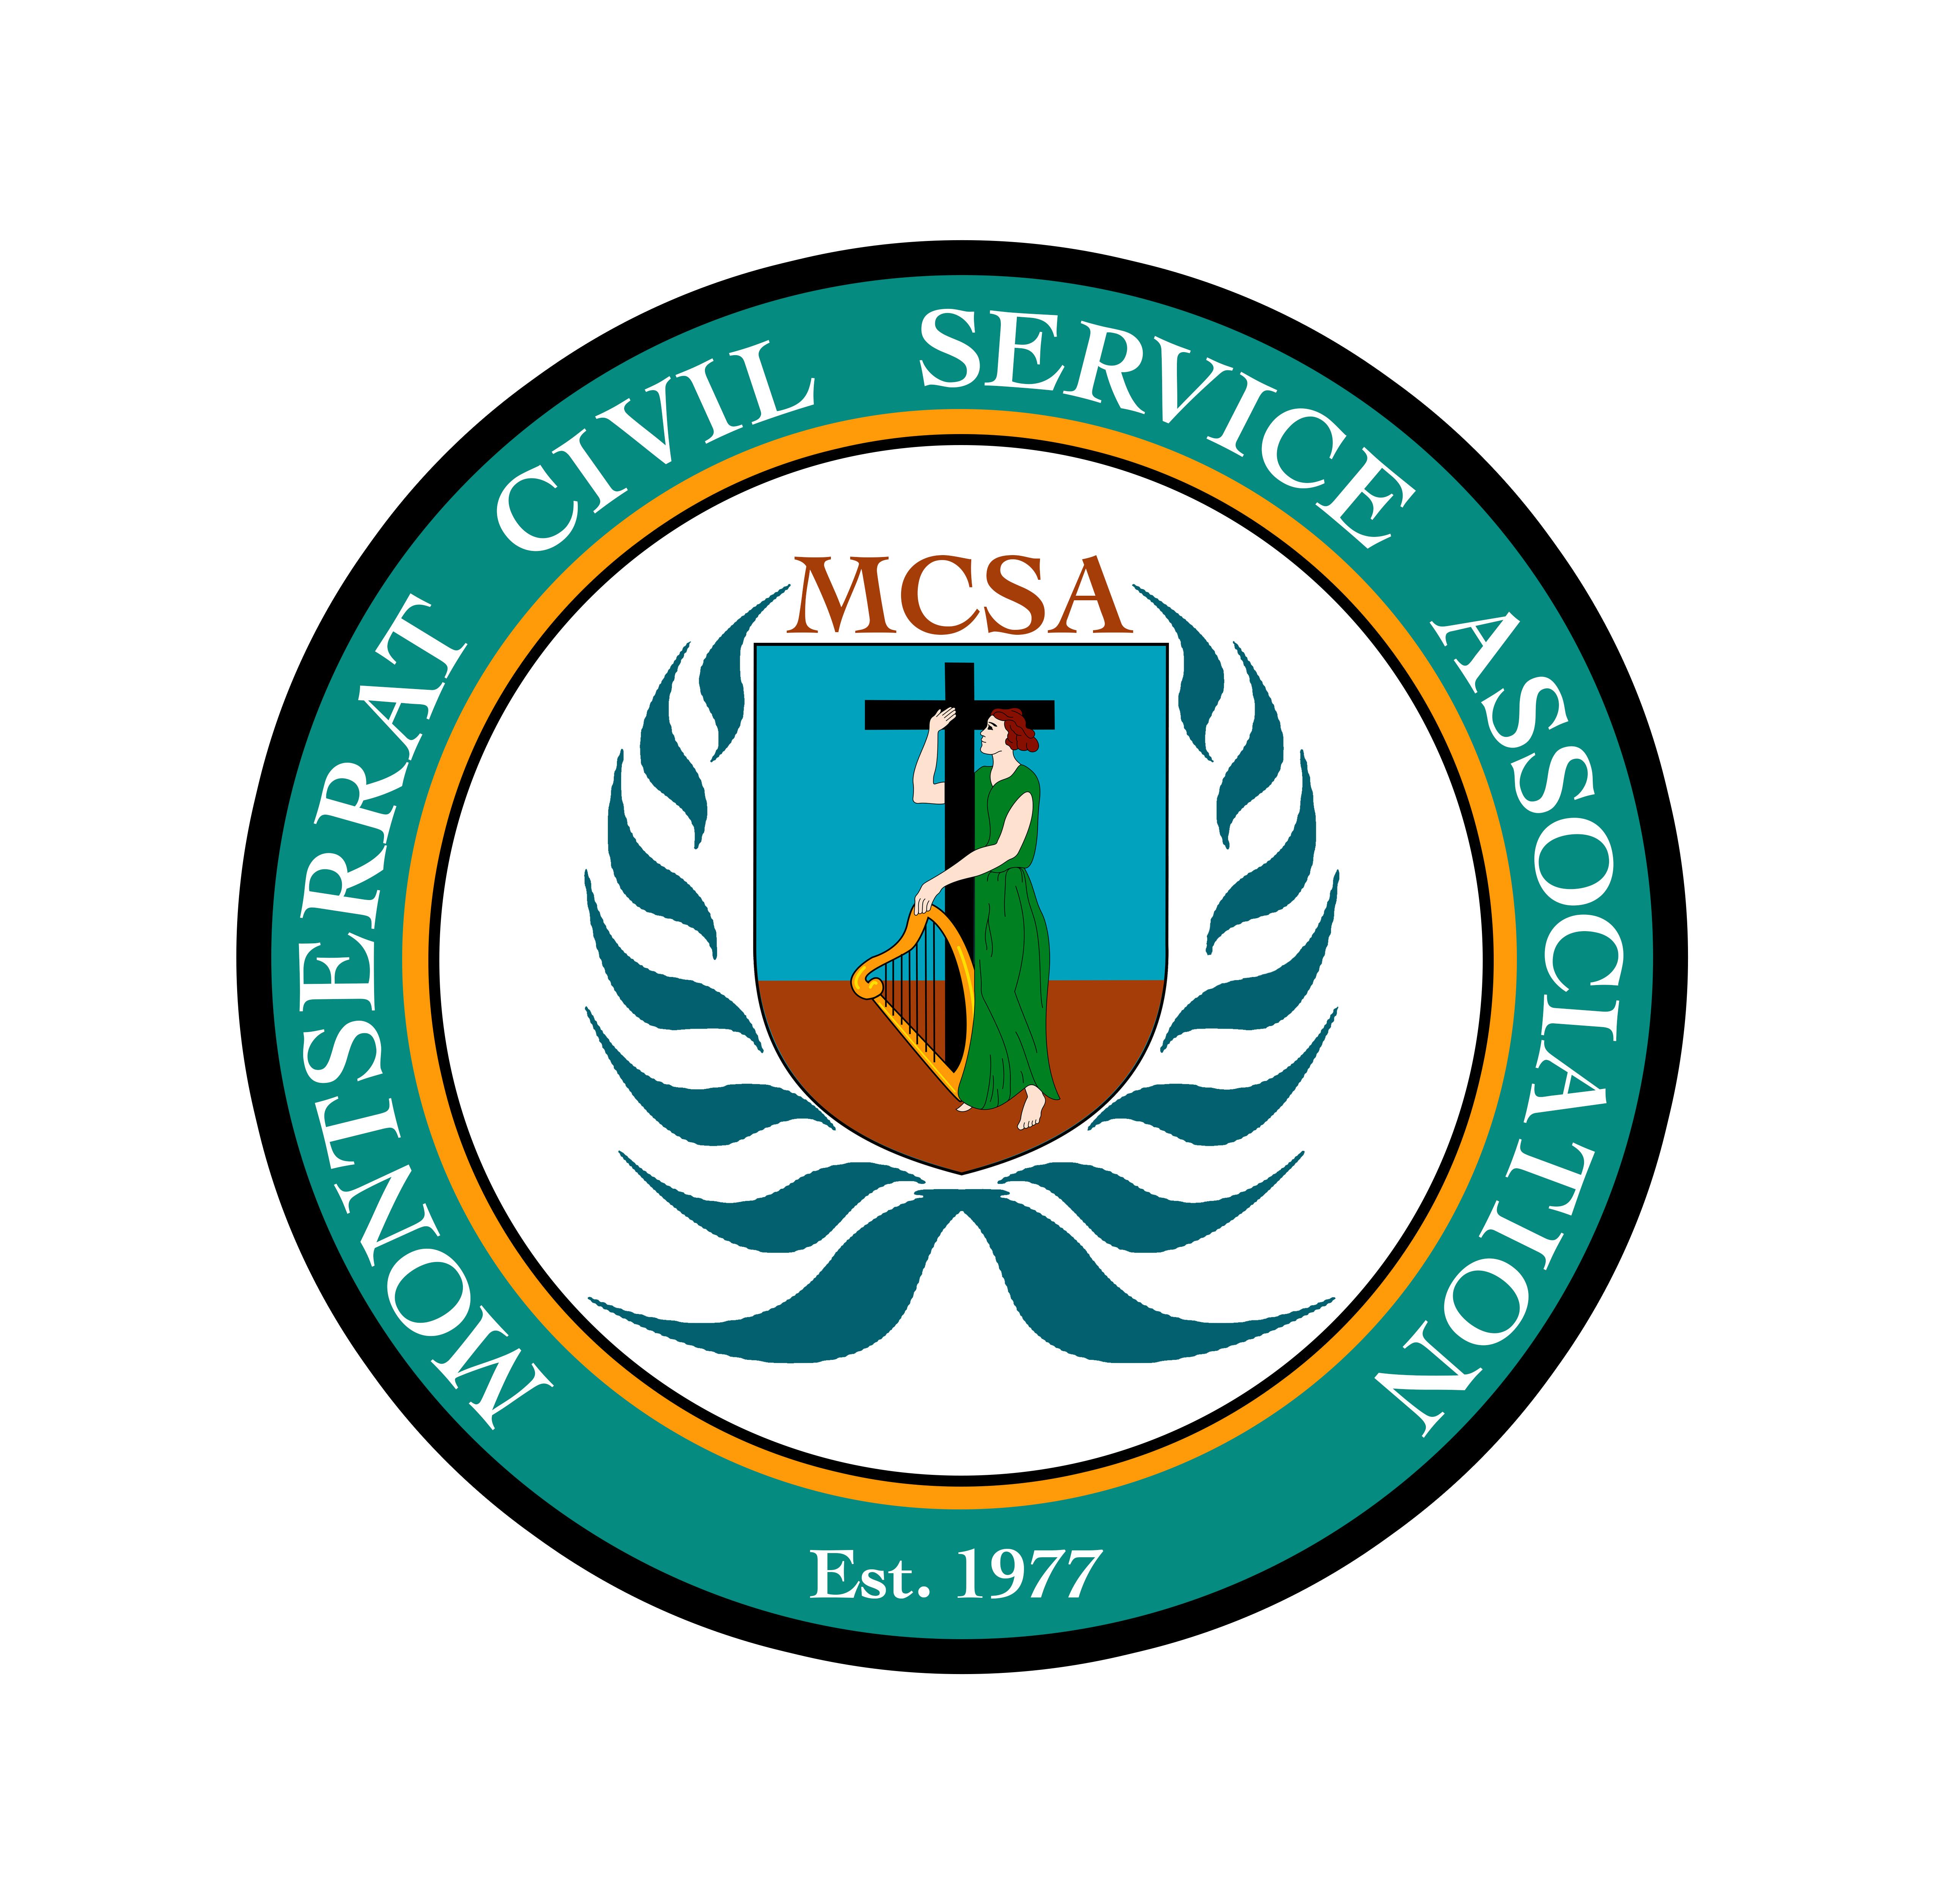 Montserrat Civil Service Assoc. Logo